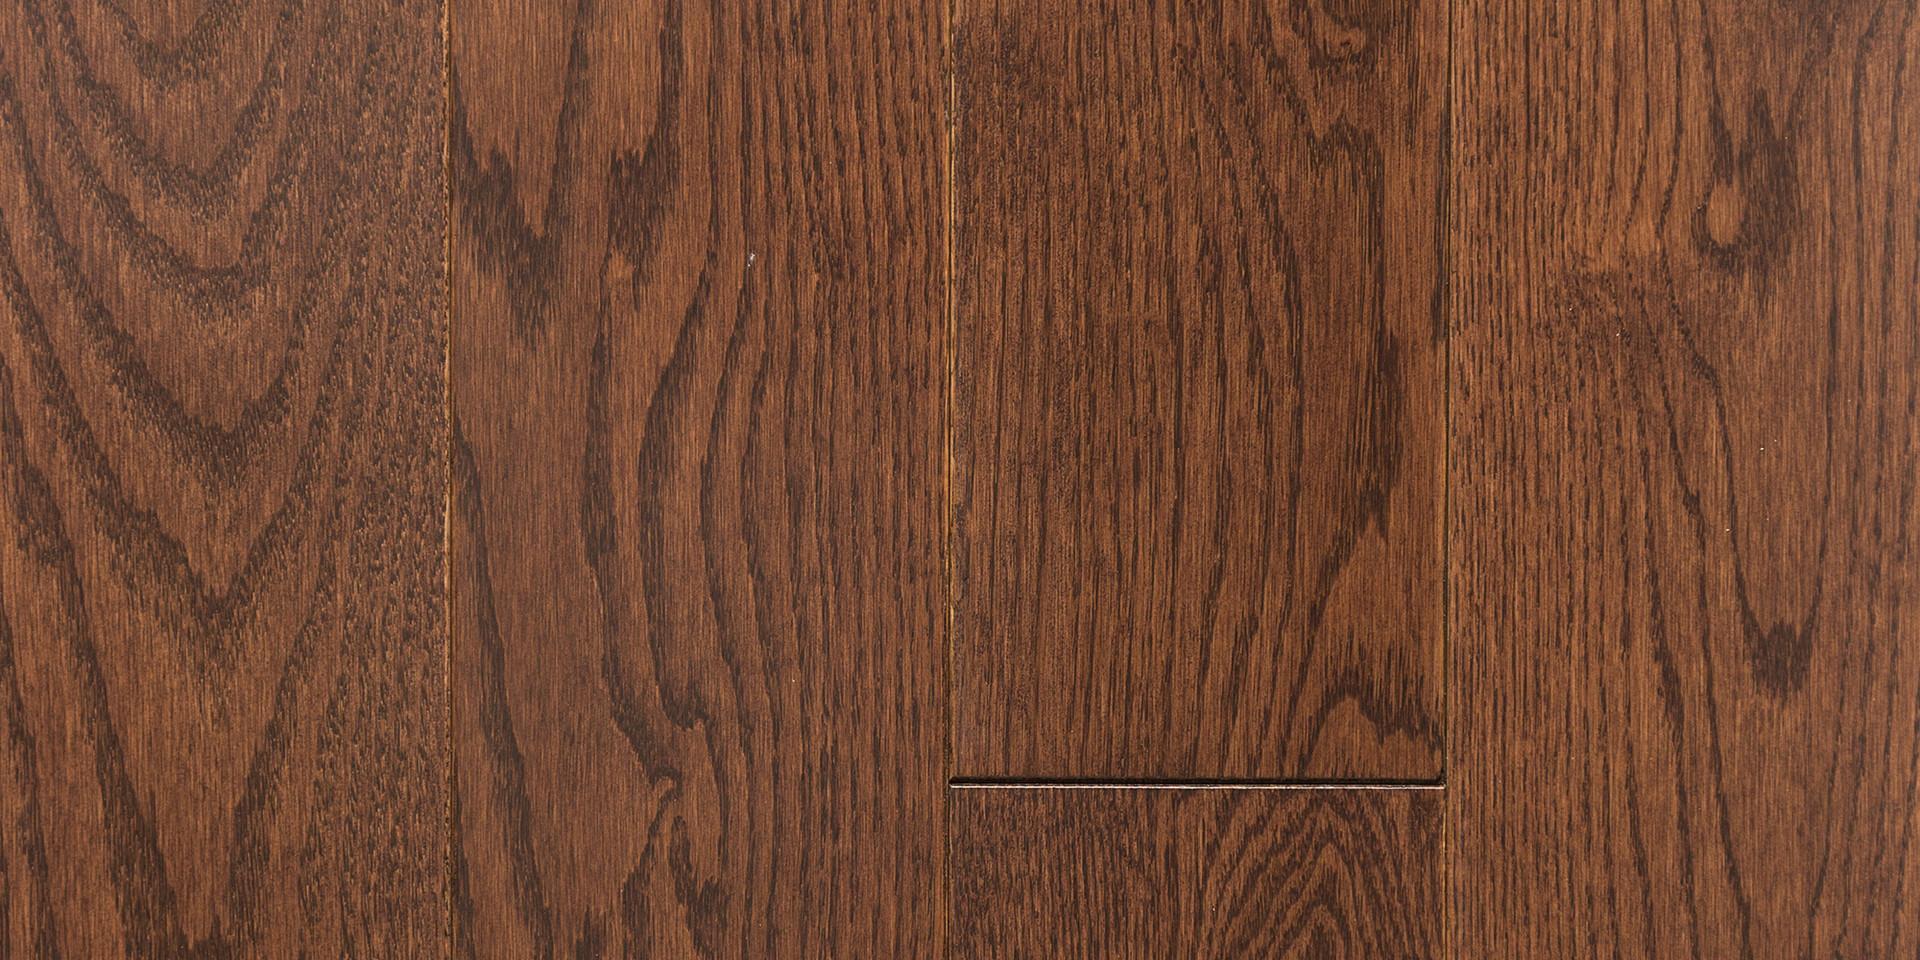 Engineered Red Oak- Walnut